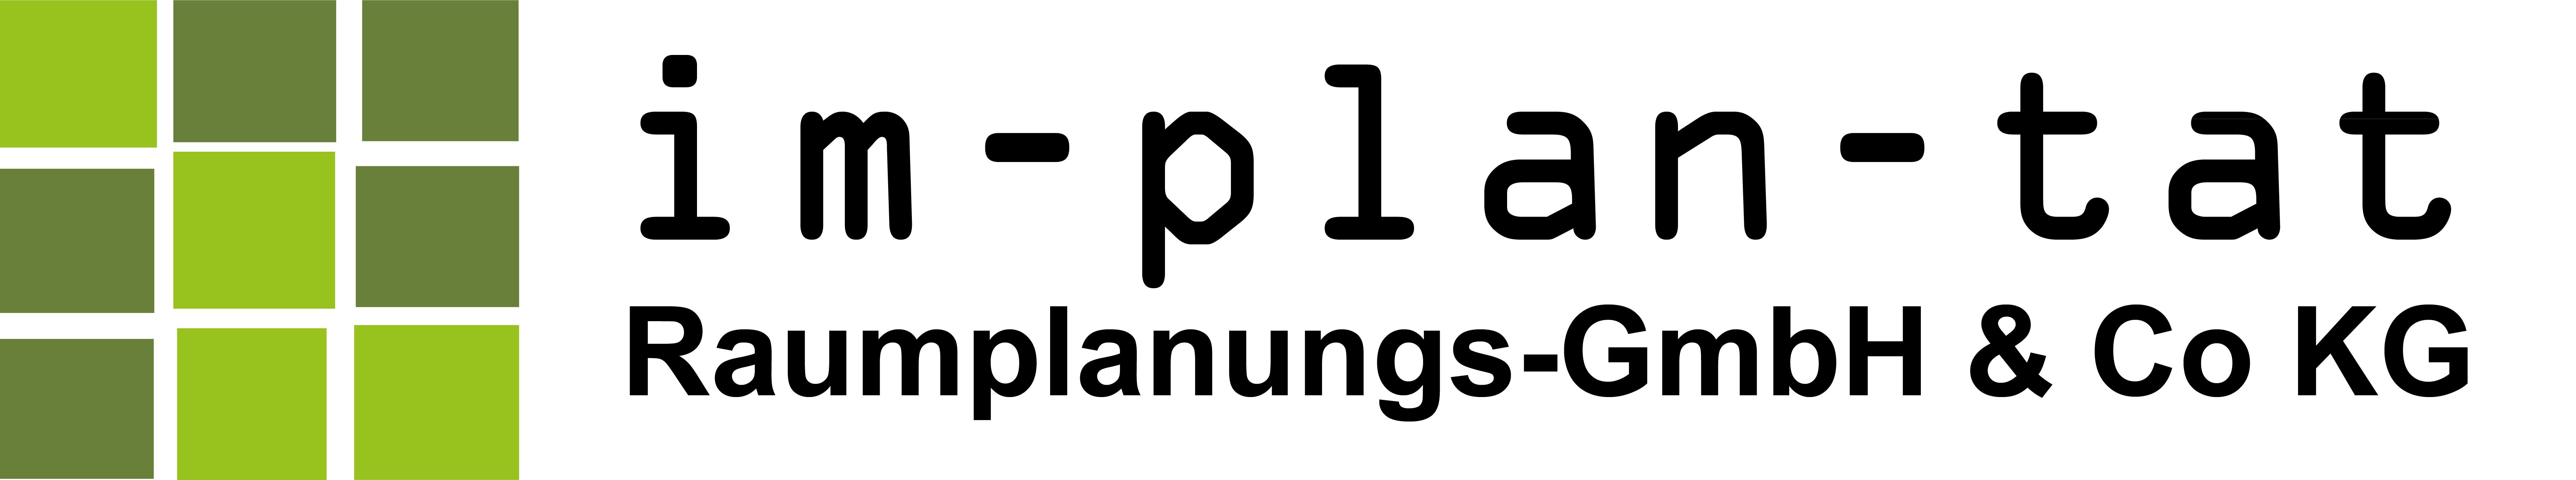 im-plan-tat Raumplanungs-GmbH & Co KG